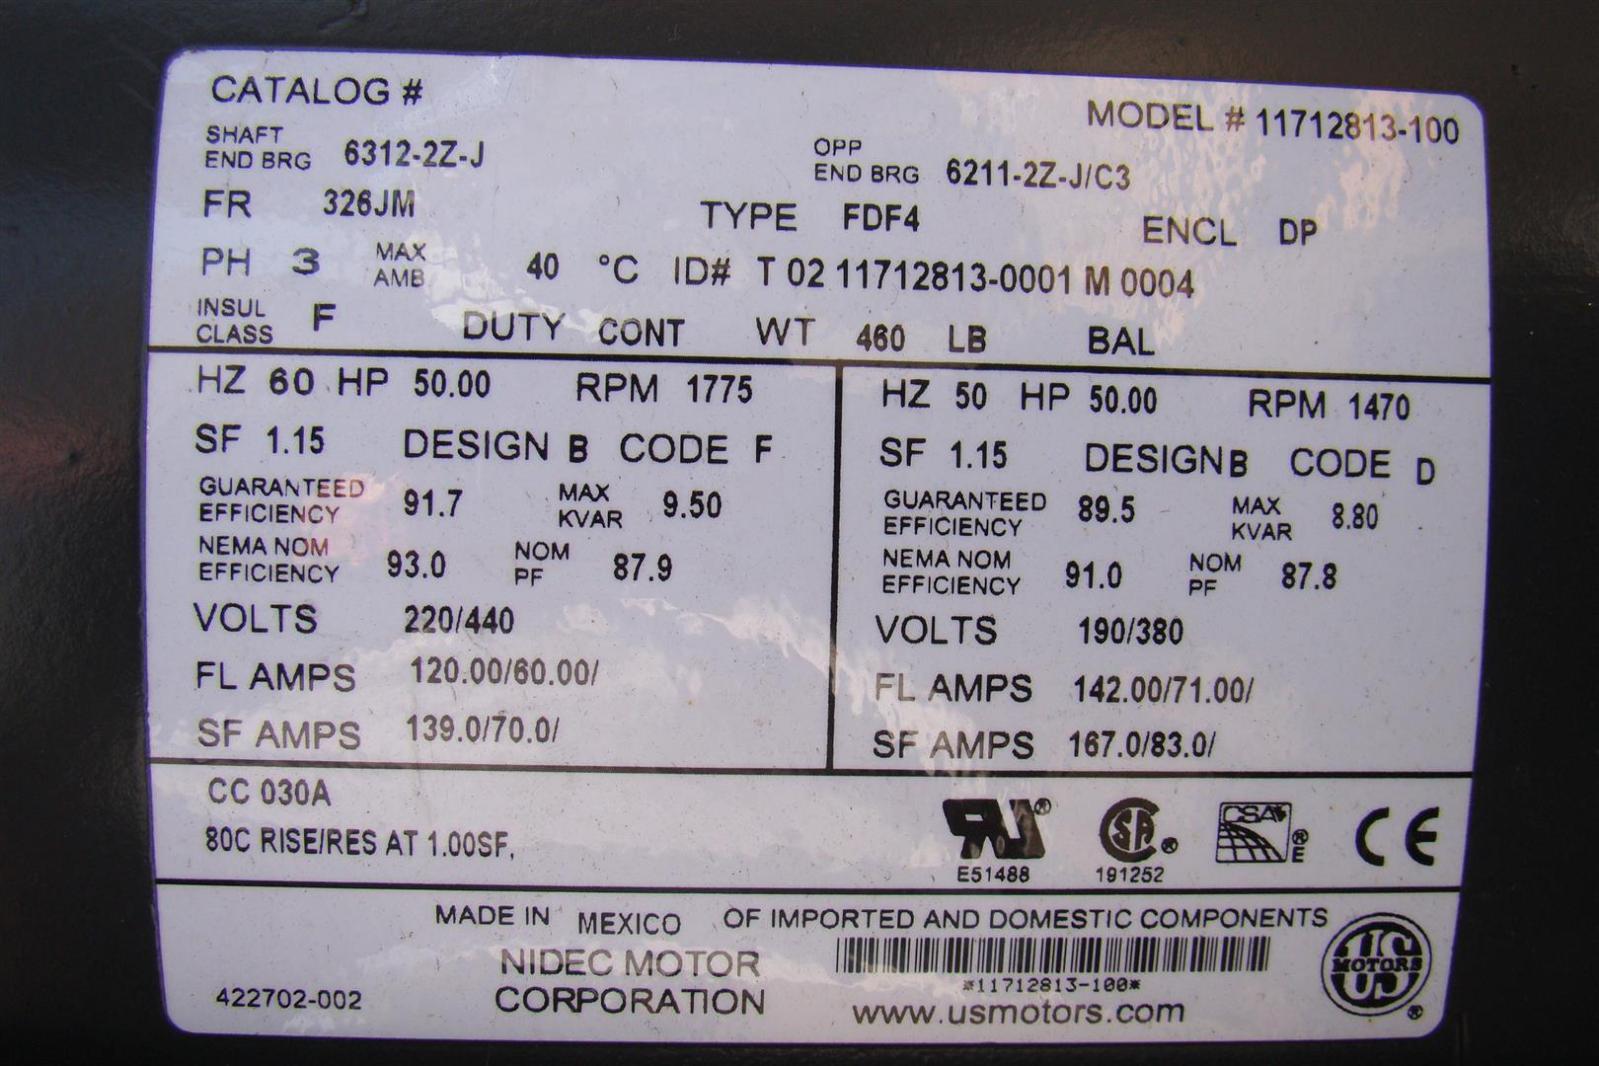 Us motors 50hp electric motor rpm17751470 220440190380v 6312 us motors 50hp electric motor rpm17751470 220440190380v 6312 publicscrutiny Images